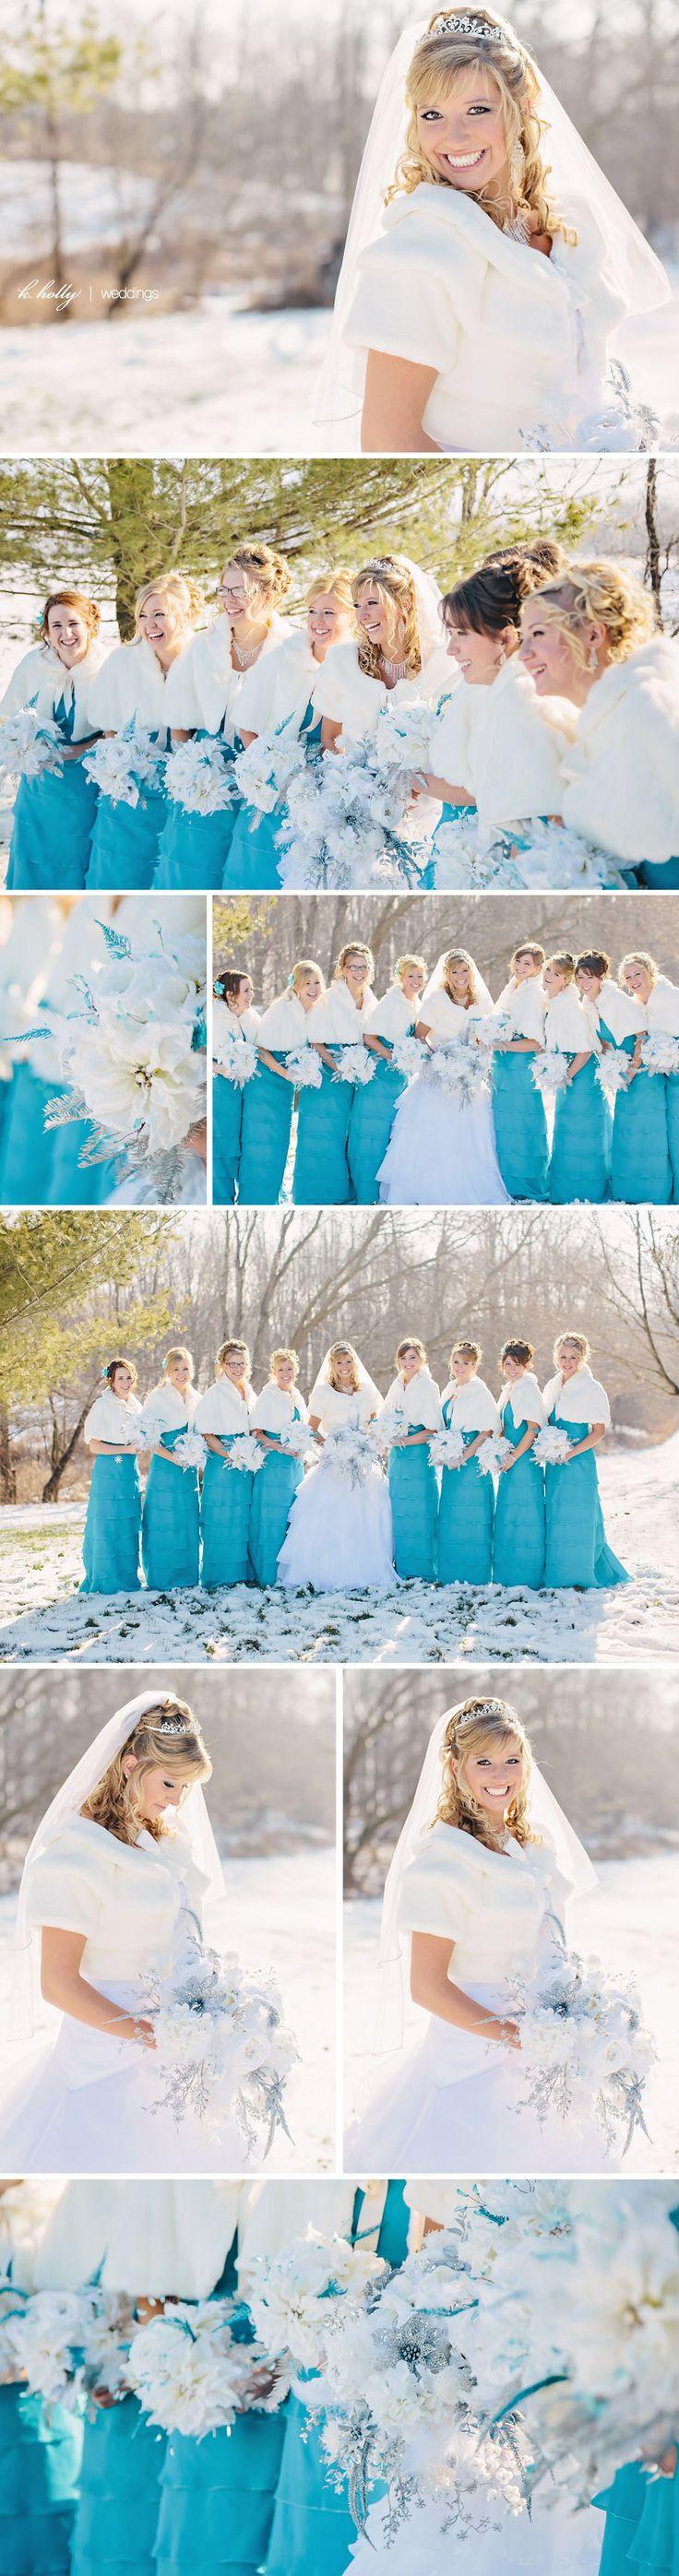 Joy and Ryan :: A Winter Wedding! | k. holly | west michigan wedding photogapher